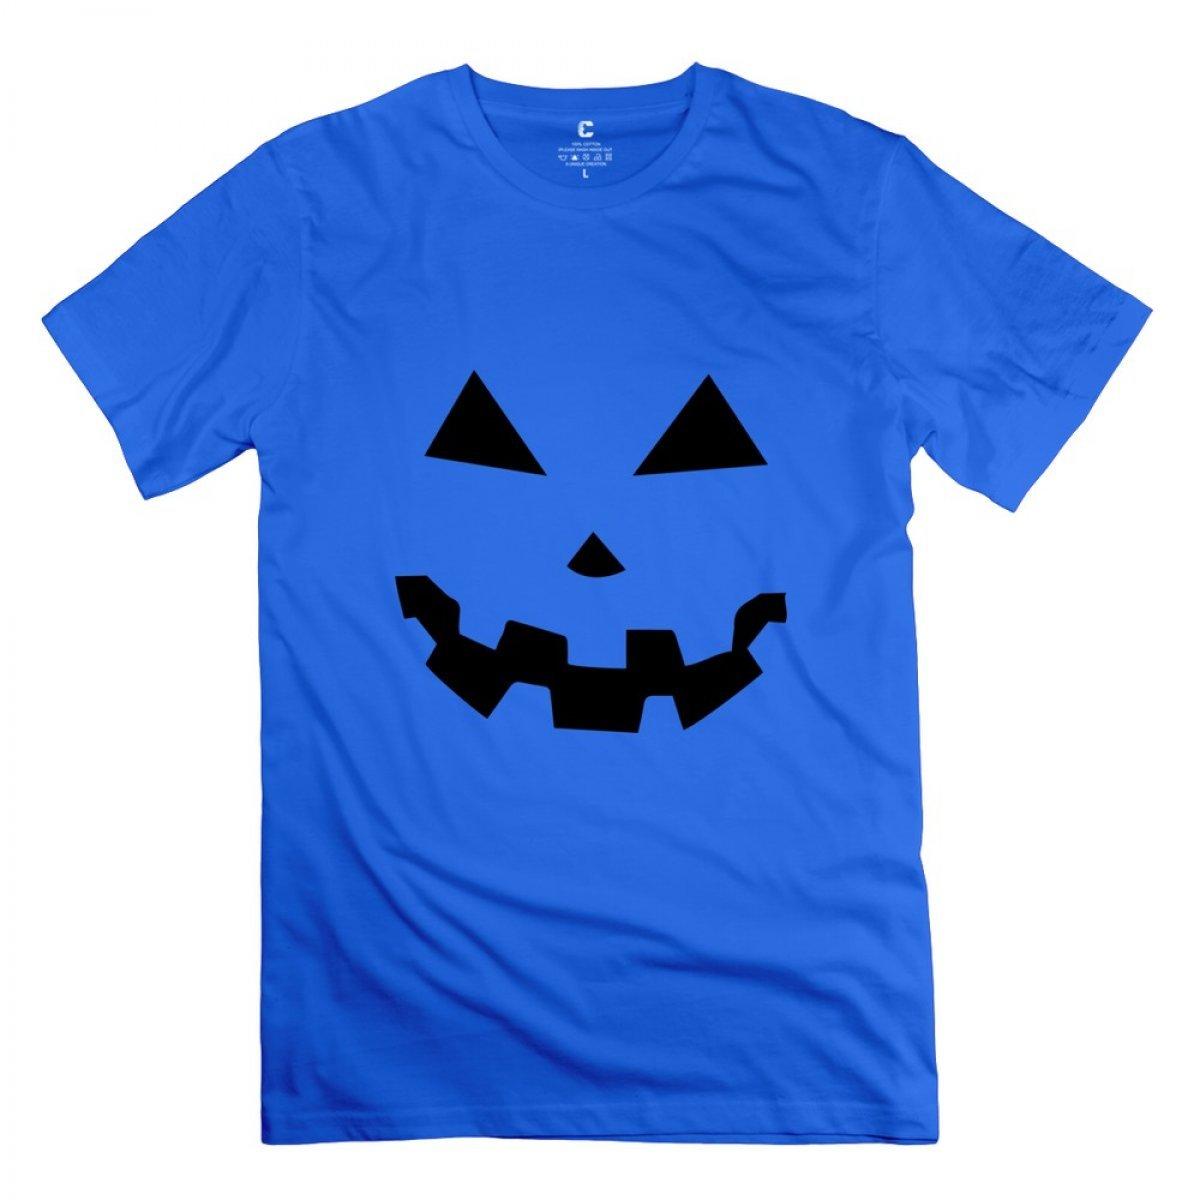 Liaoyang Jackolantern Two Halloween Pumpkins Royal Blue Adult Standard Weight Tshirt For